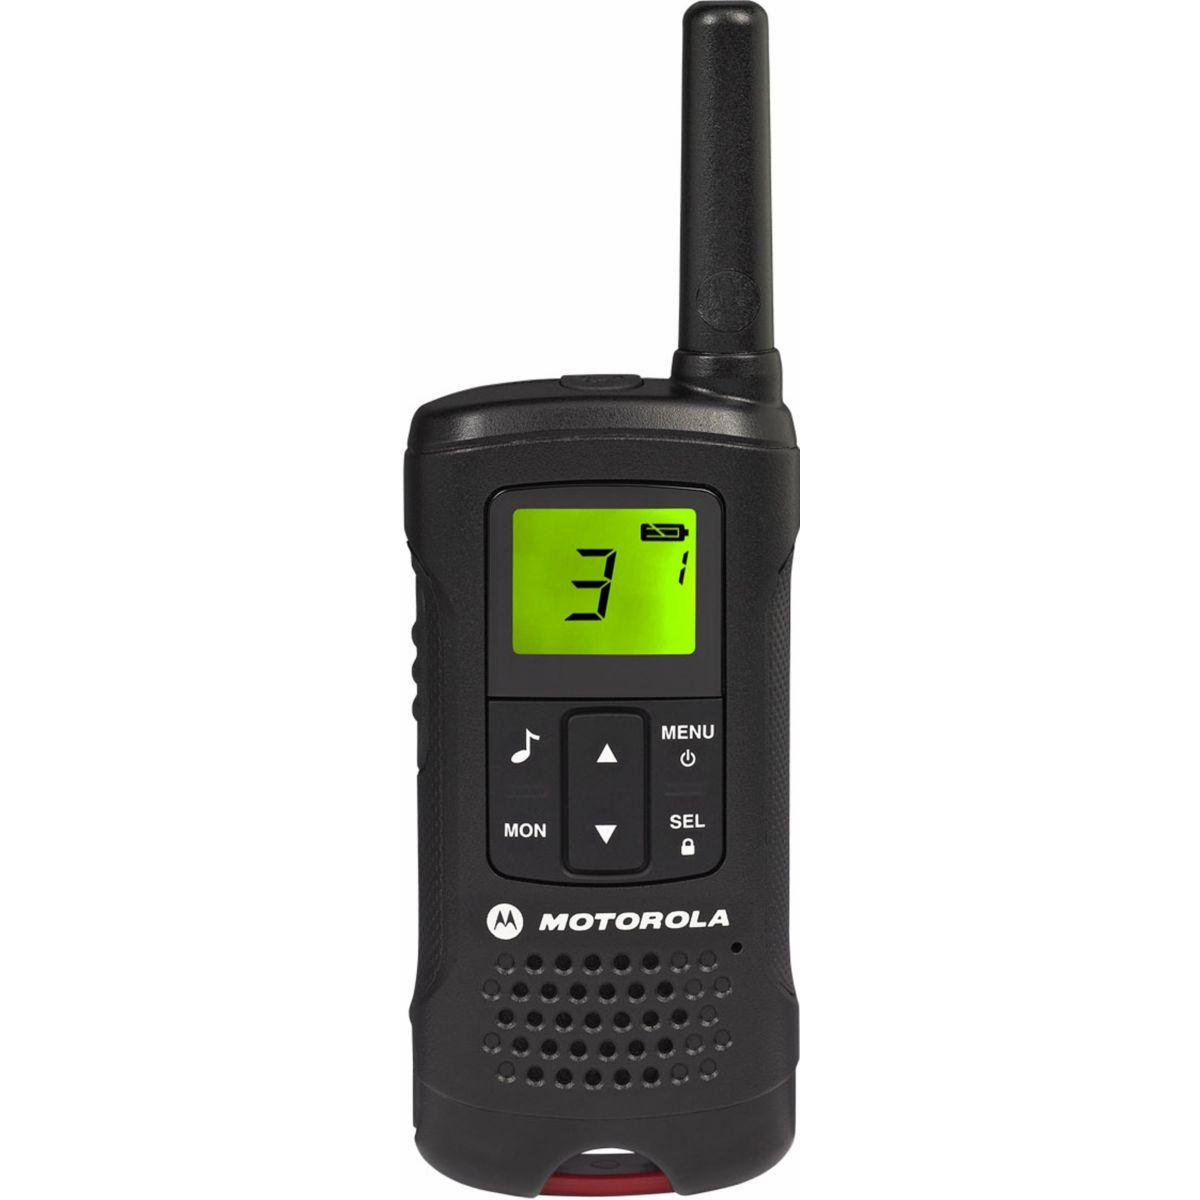 Talkie walkie motorola t60 - livraison offerte : code premium (photo)